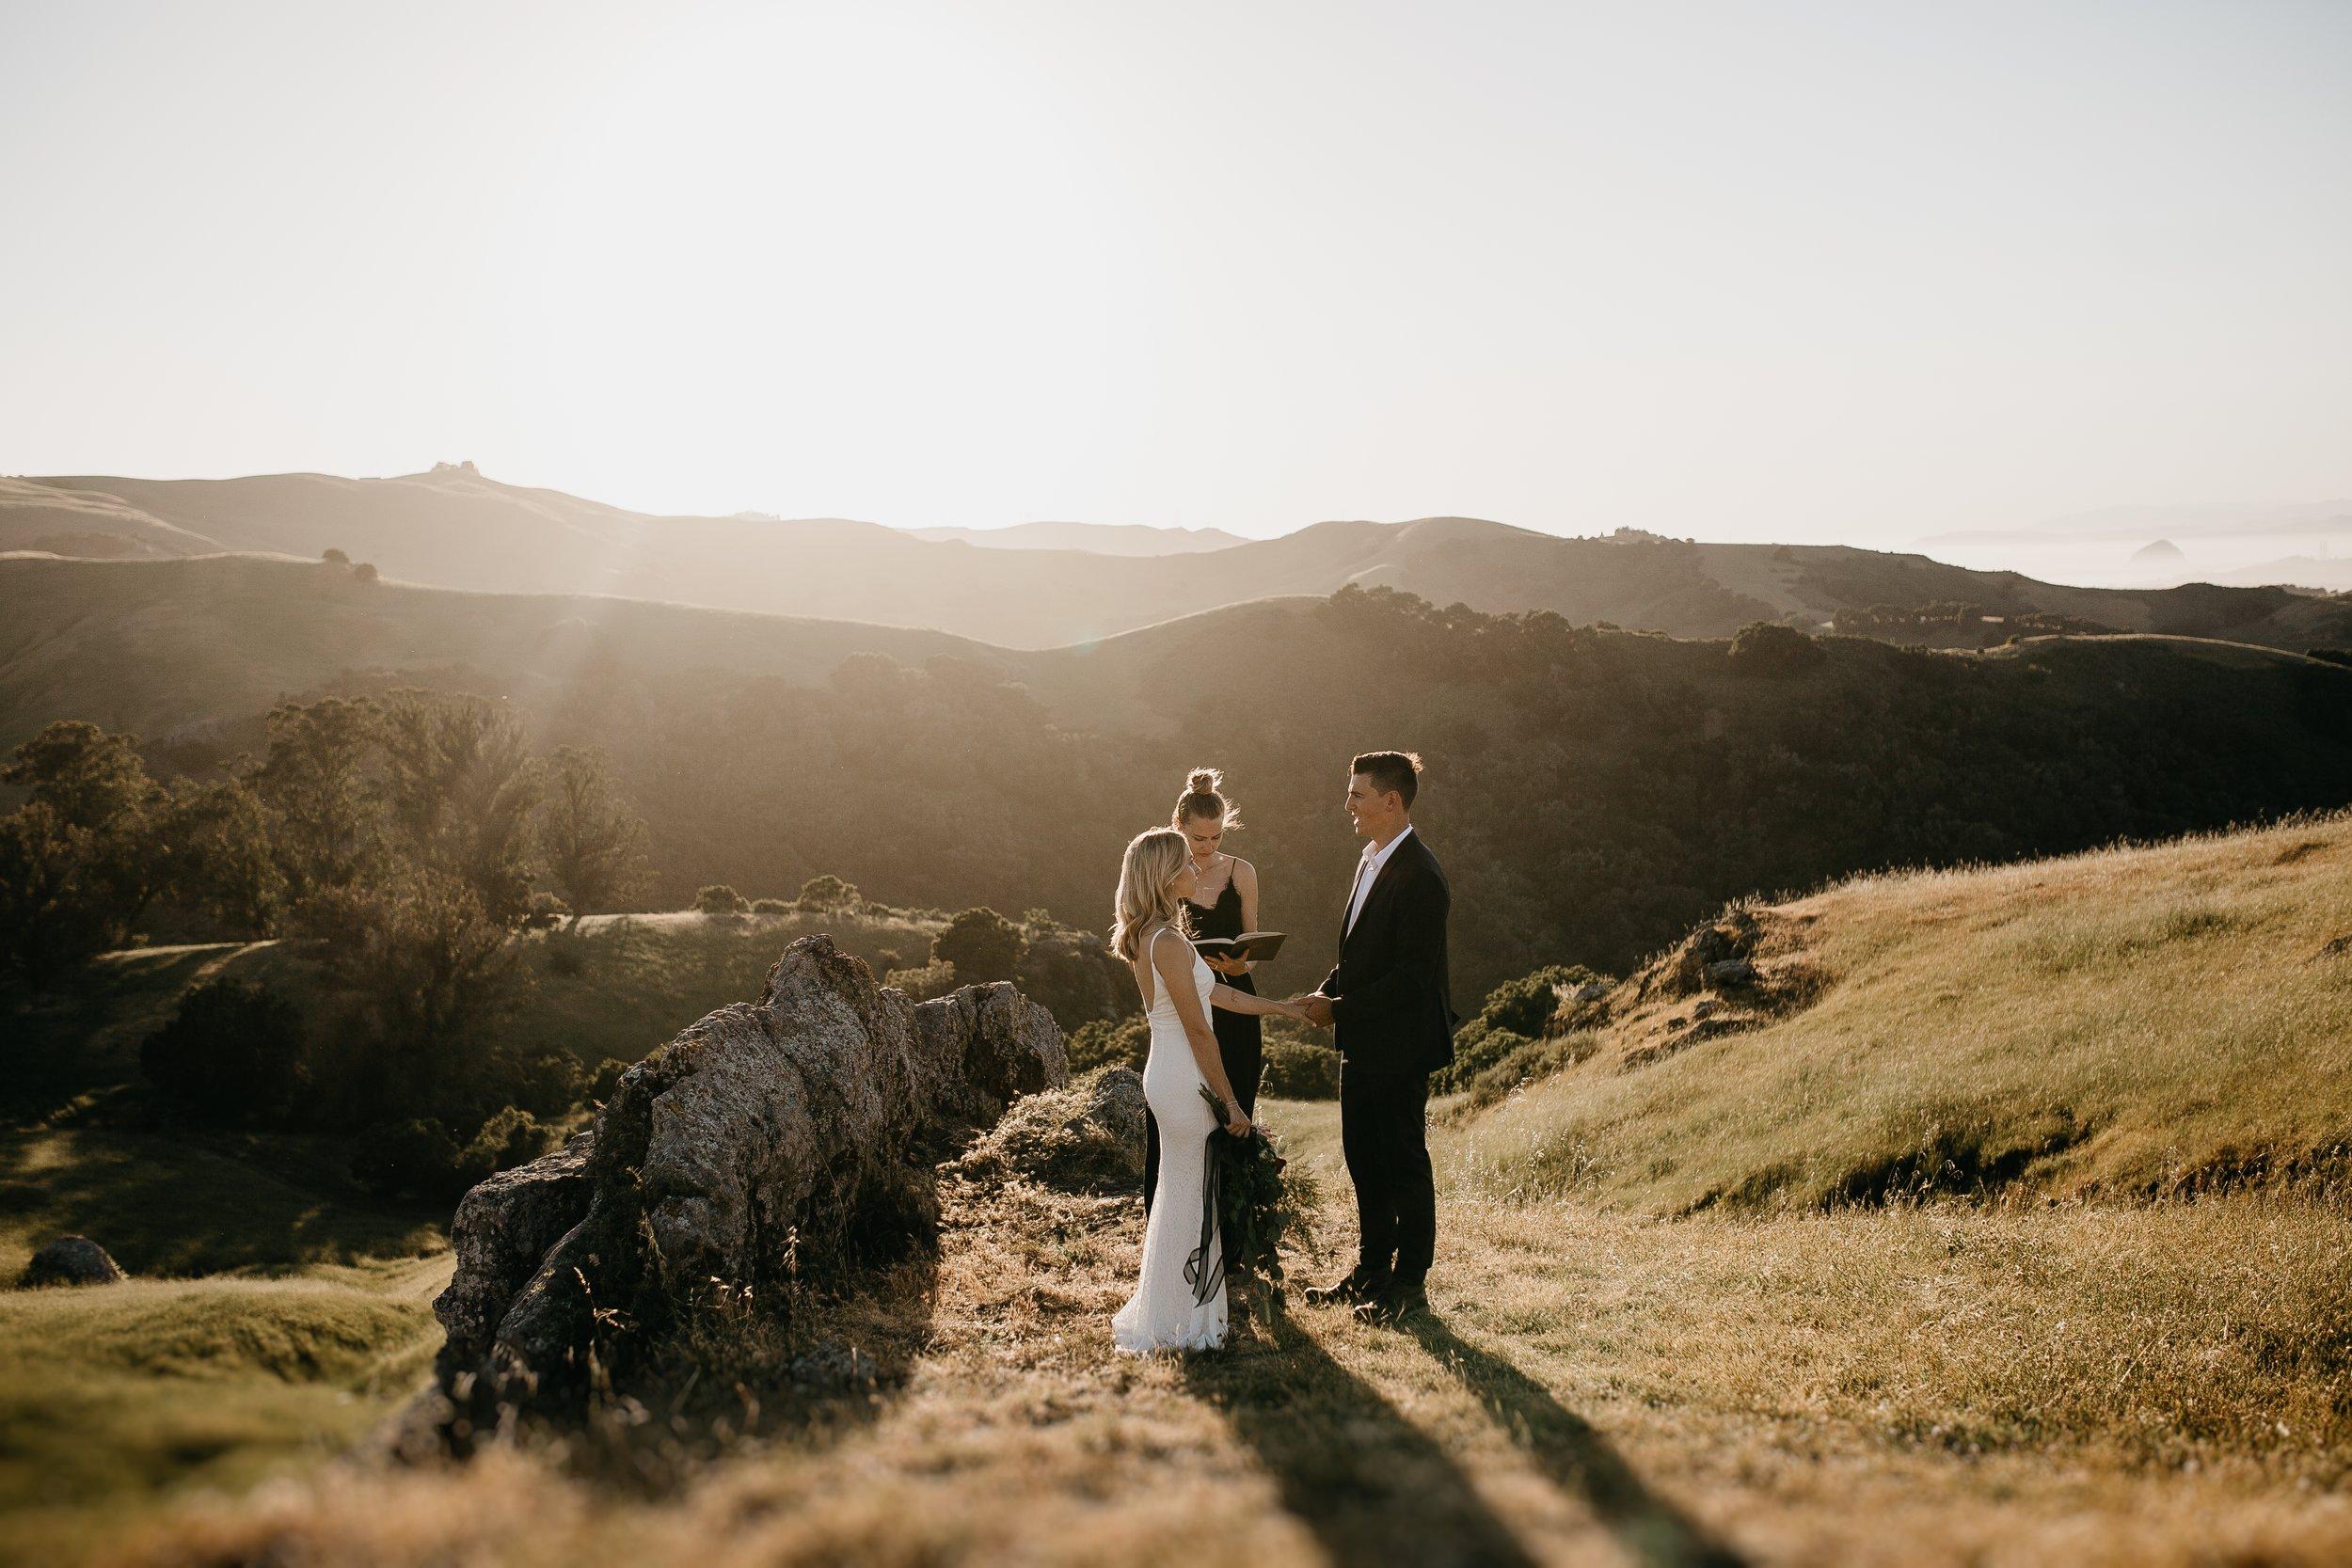 Makenna & Jake - San Luis Obispo, California